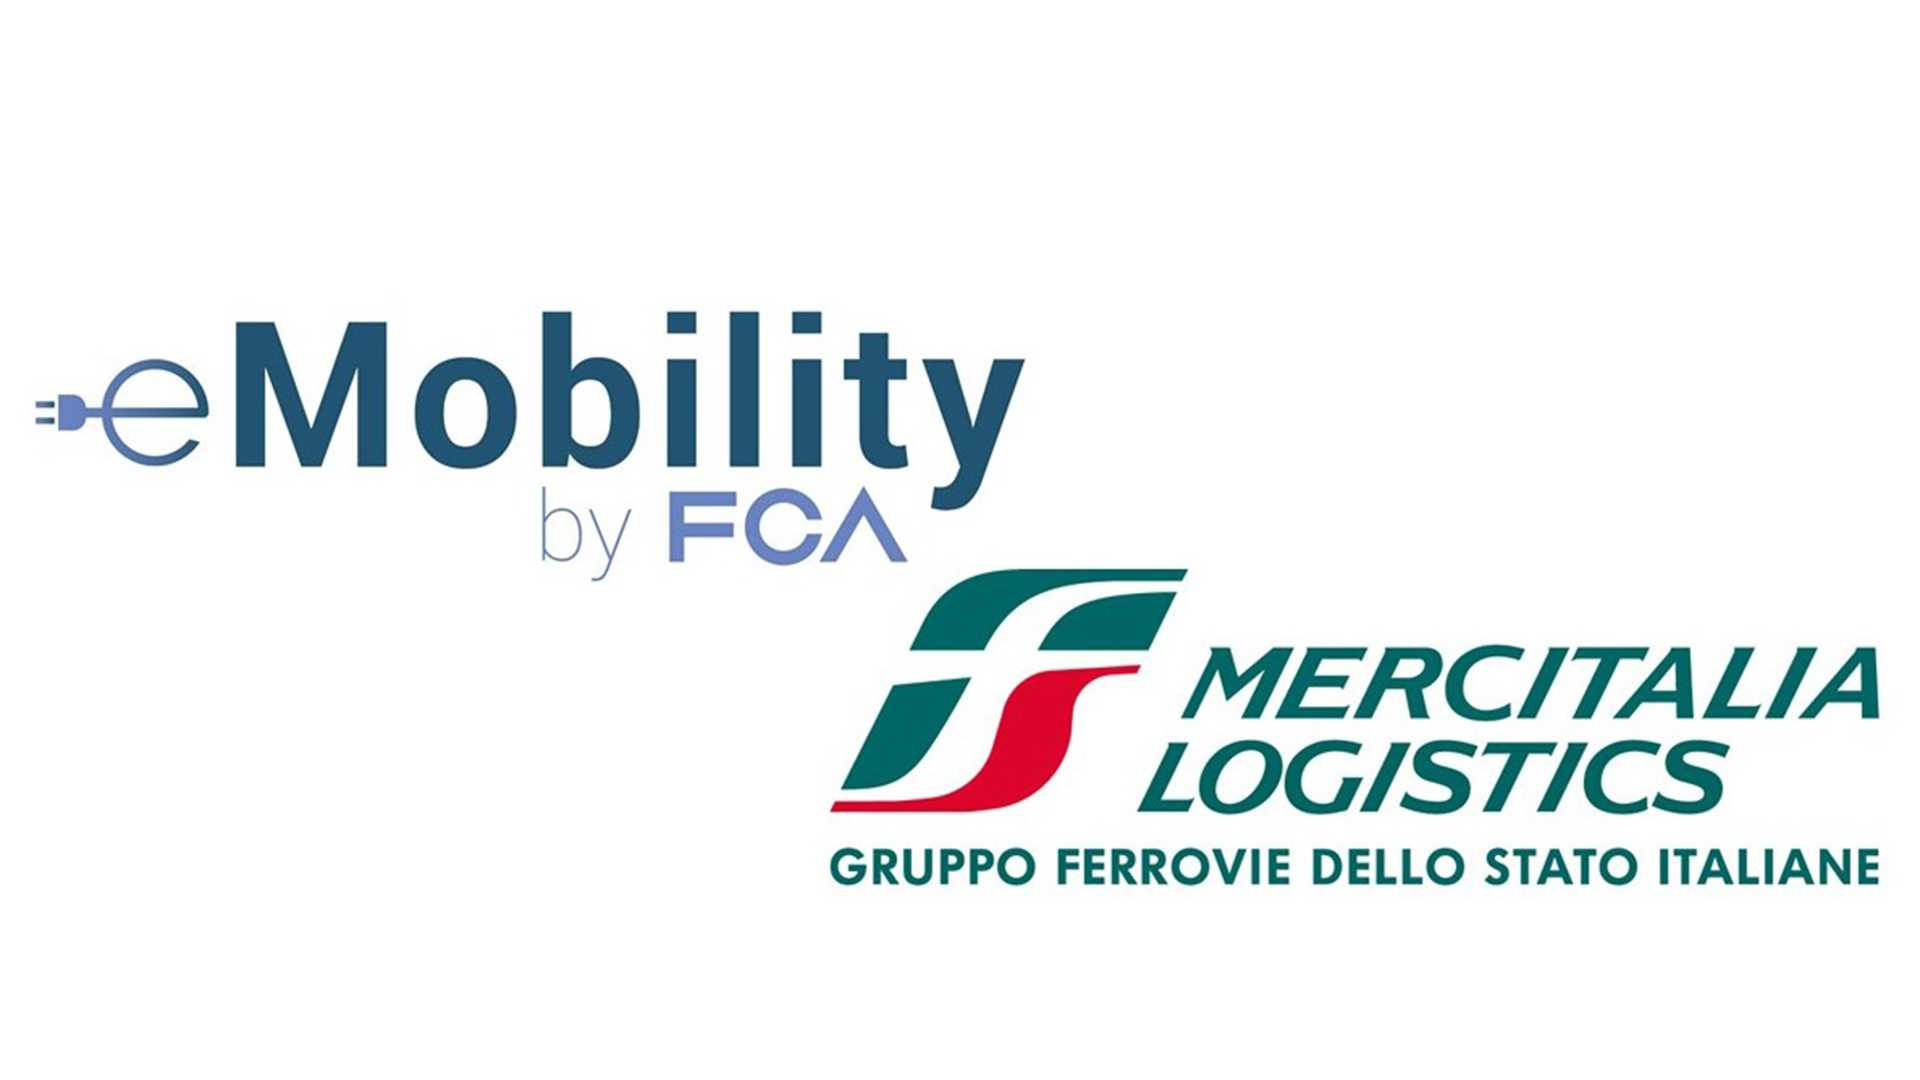 Situazione FCA - Pagina 3 E-mobilty-fca-e-mercitalia-logistics